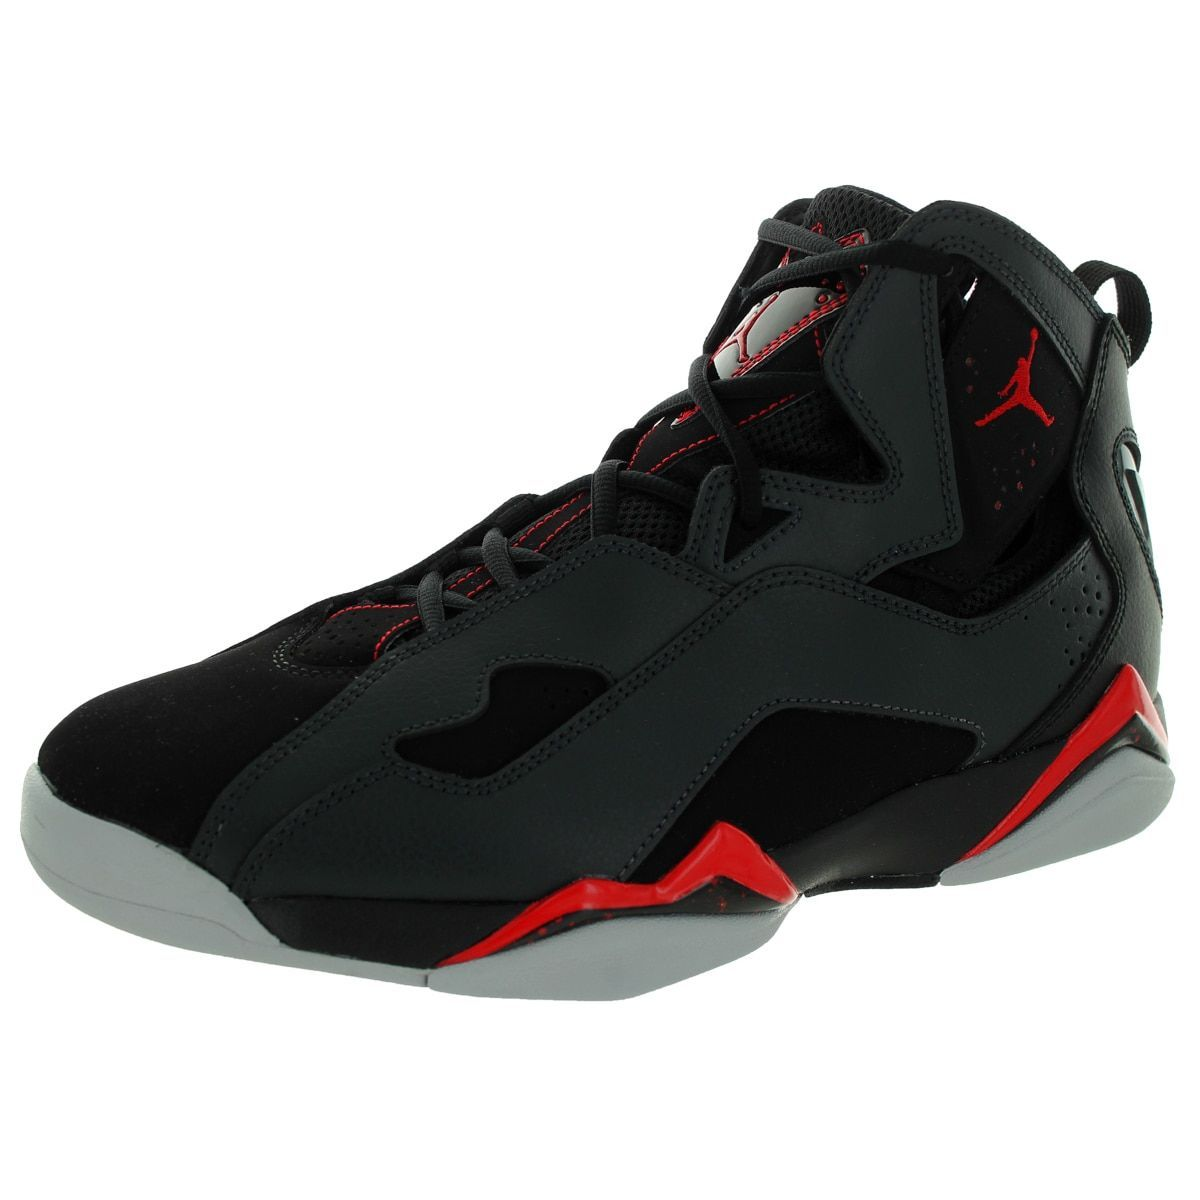 Nike Jordan Men\u0027s Jordan True Flight /Gym Red/Anthracite/Wlf Basketball Shoe